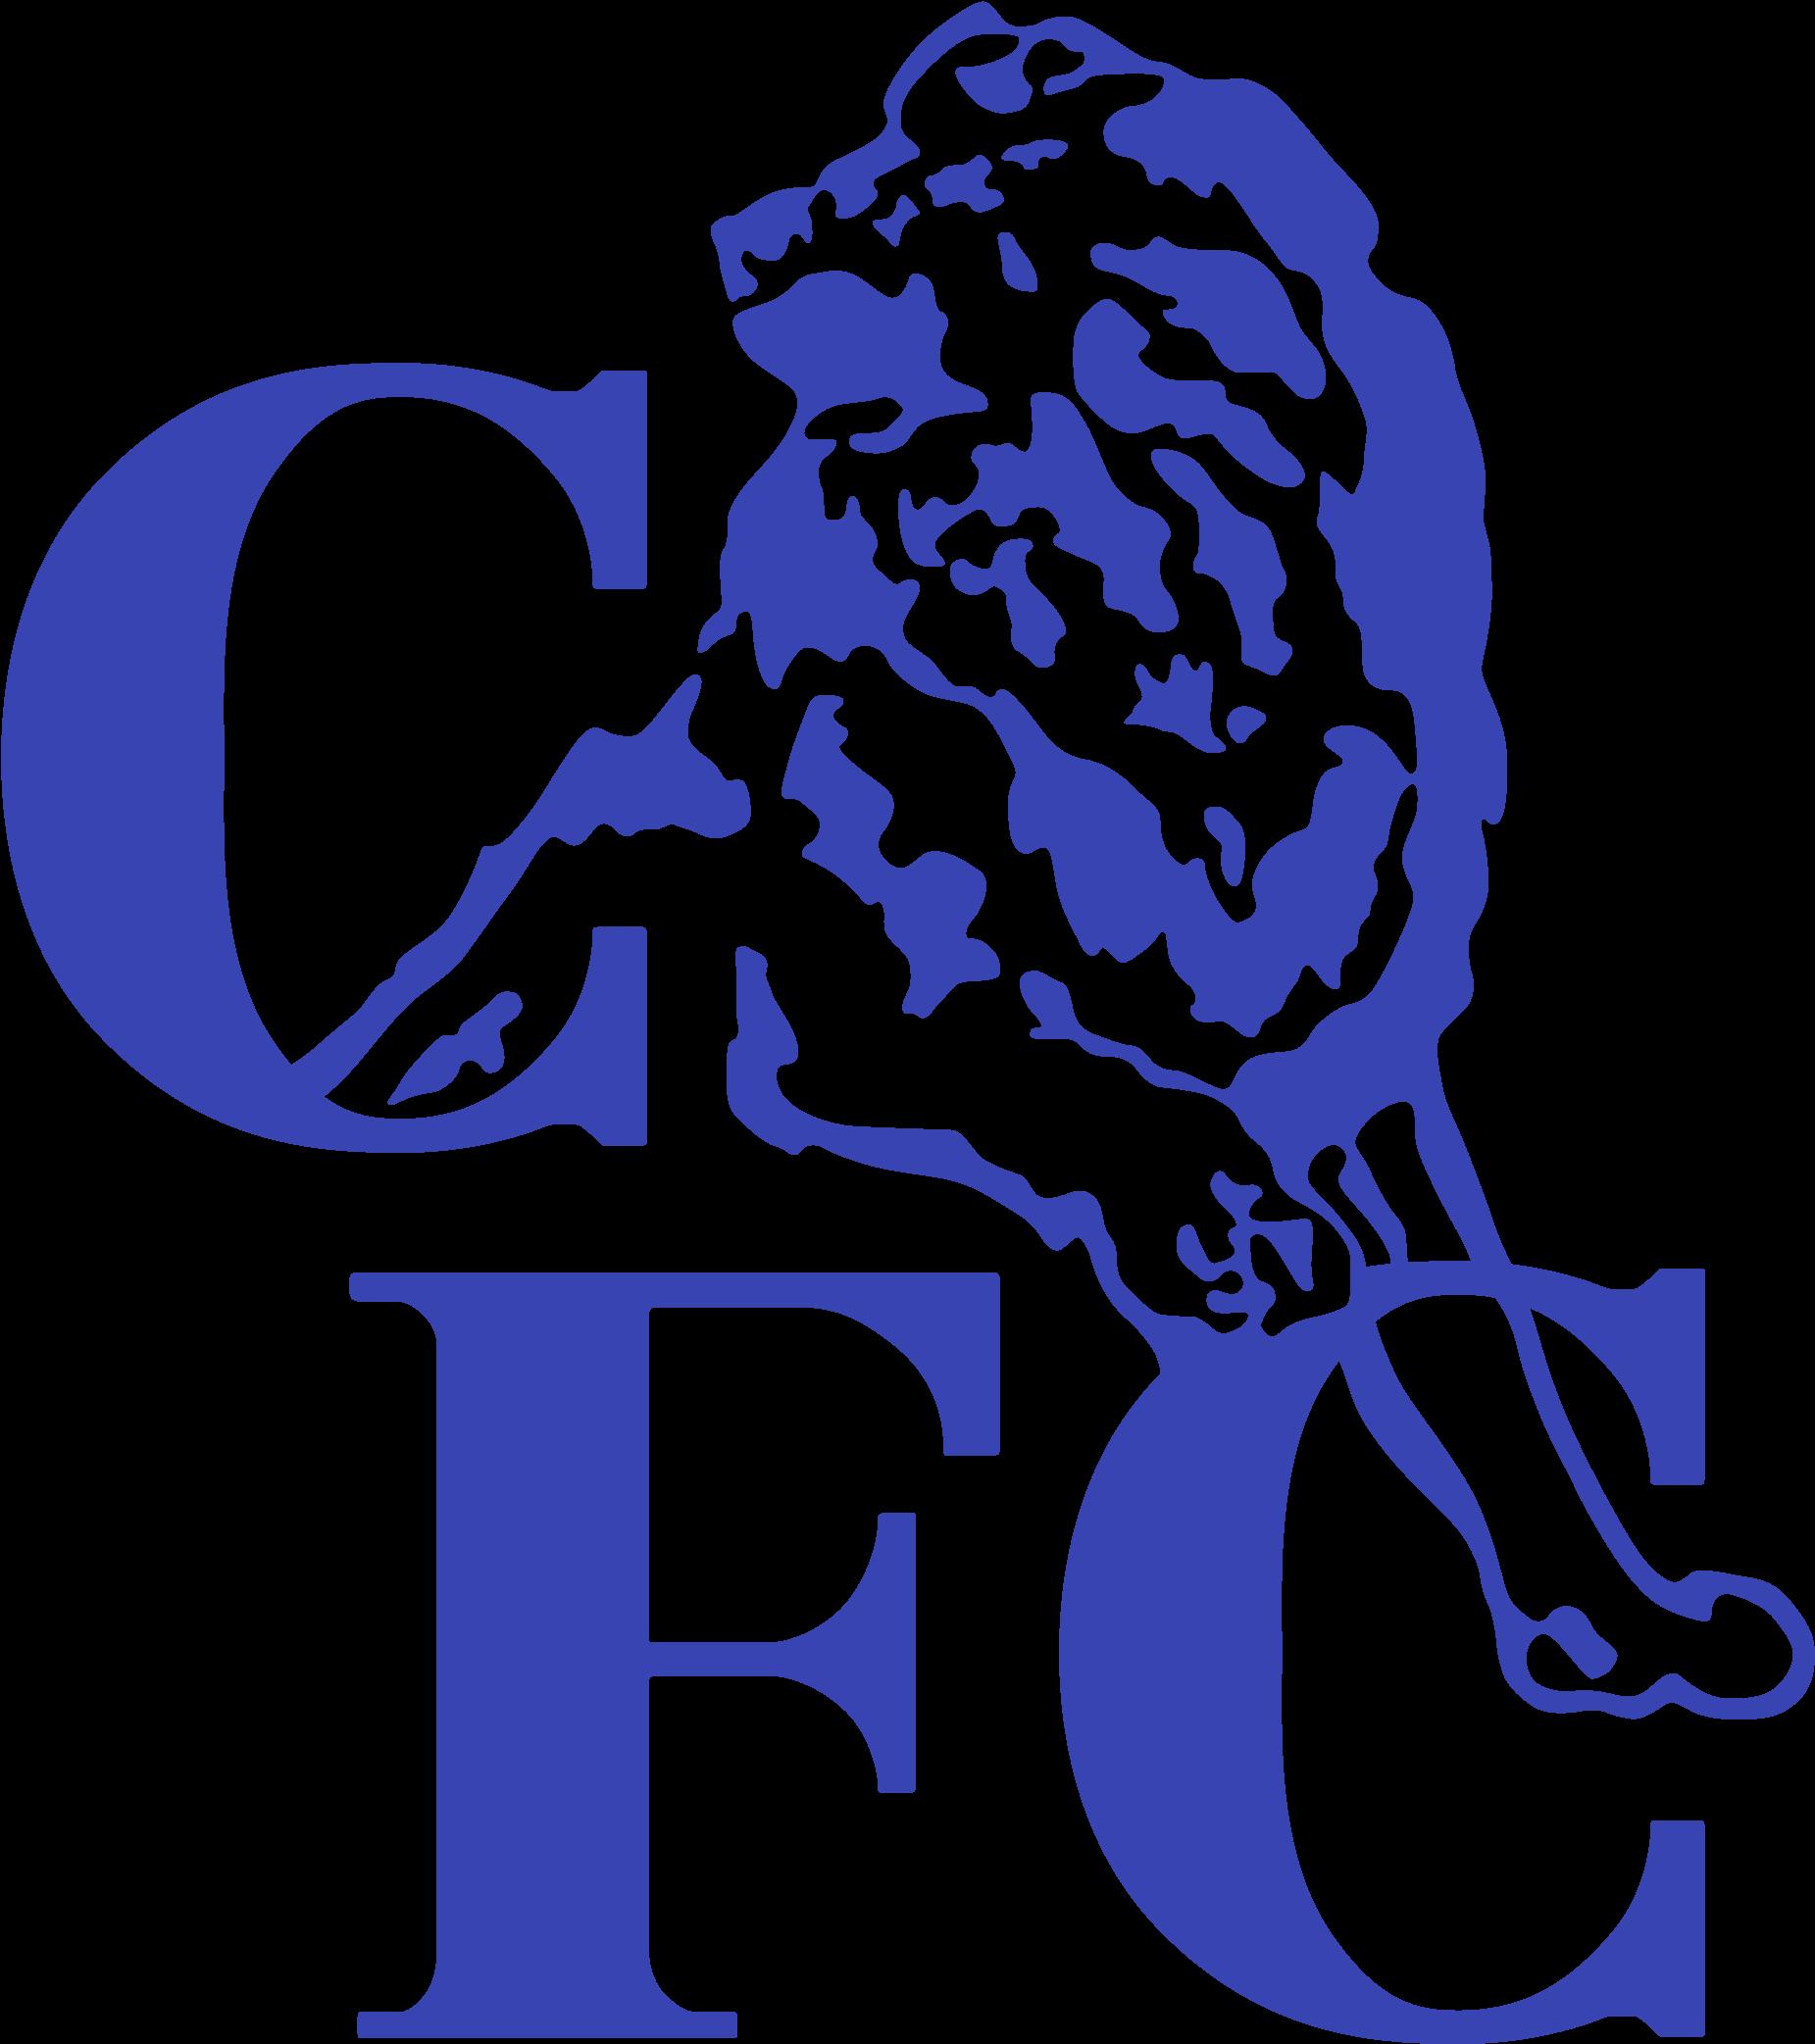 HD Chelsea Logo Png Transparent PNG Image Download.